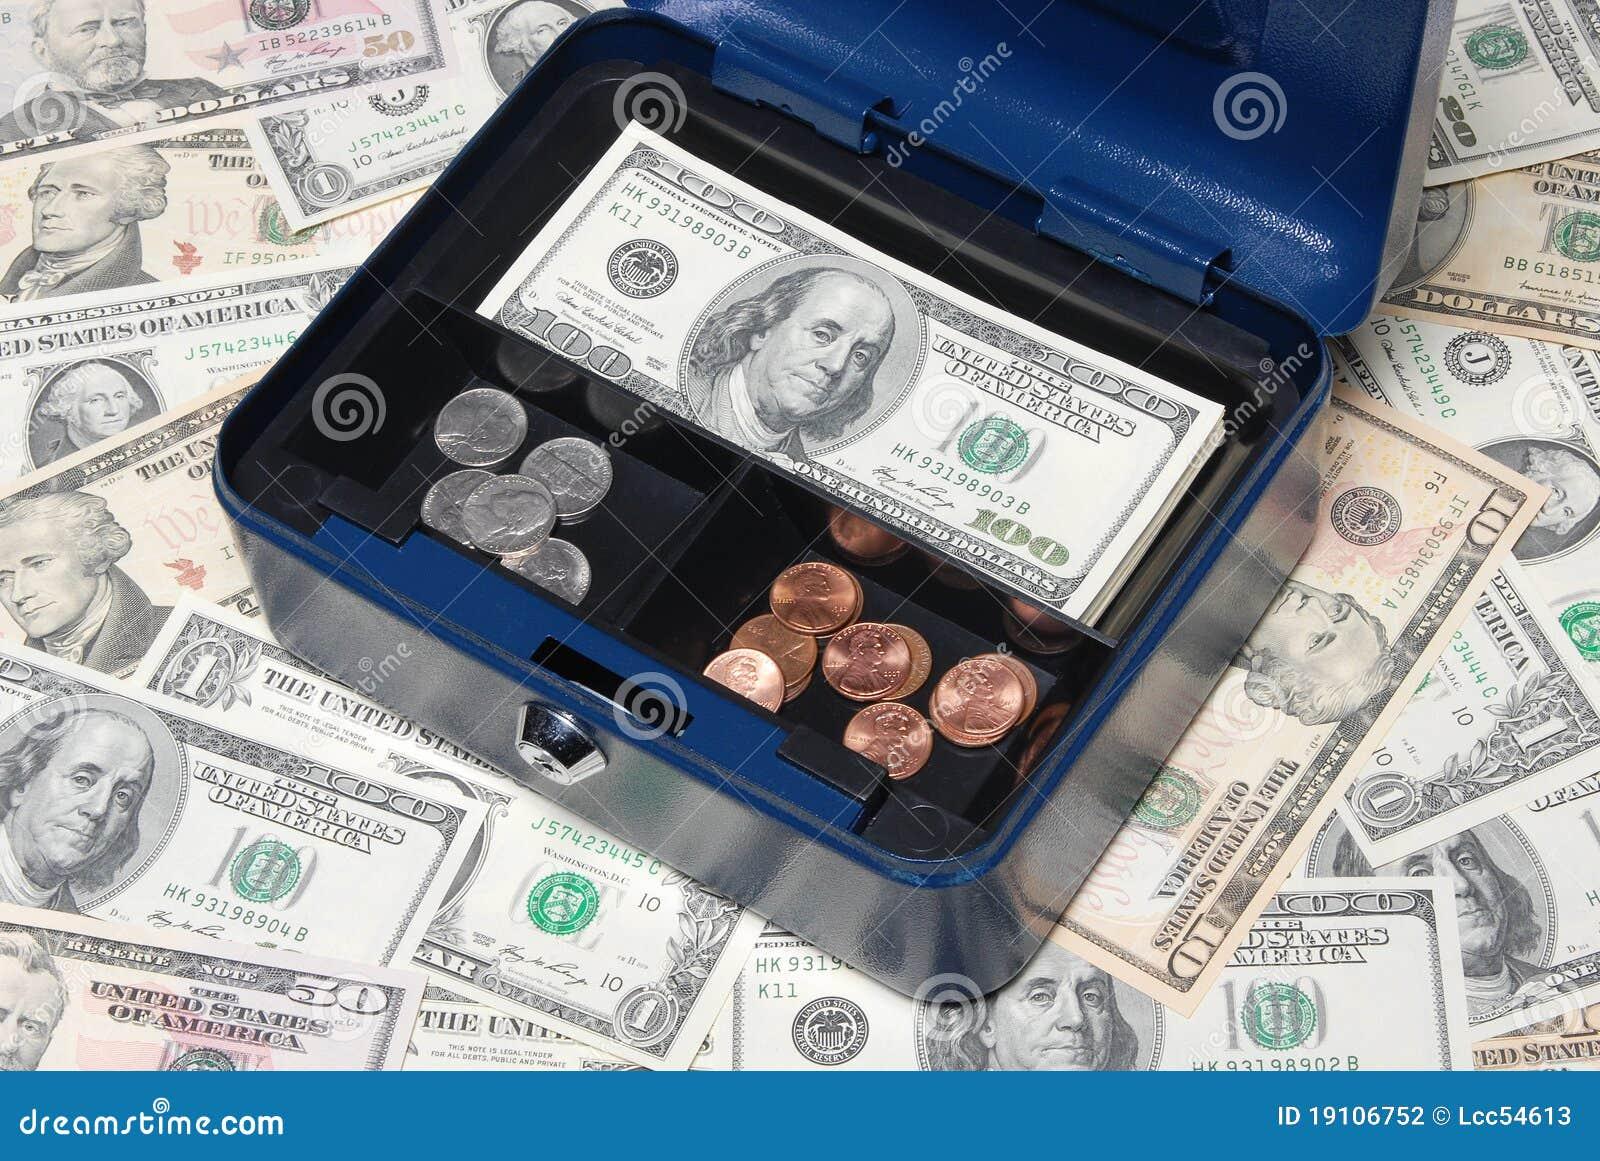 Cash Safety Deposit Box Stock Photography Image 19106752